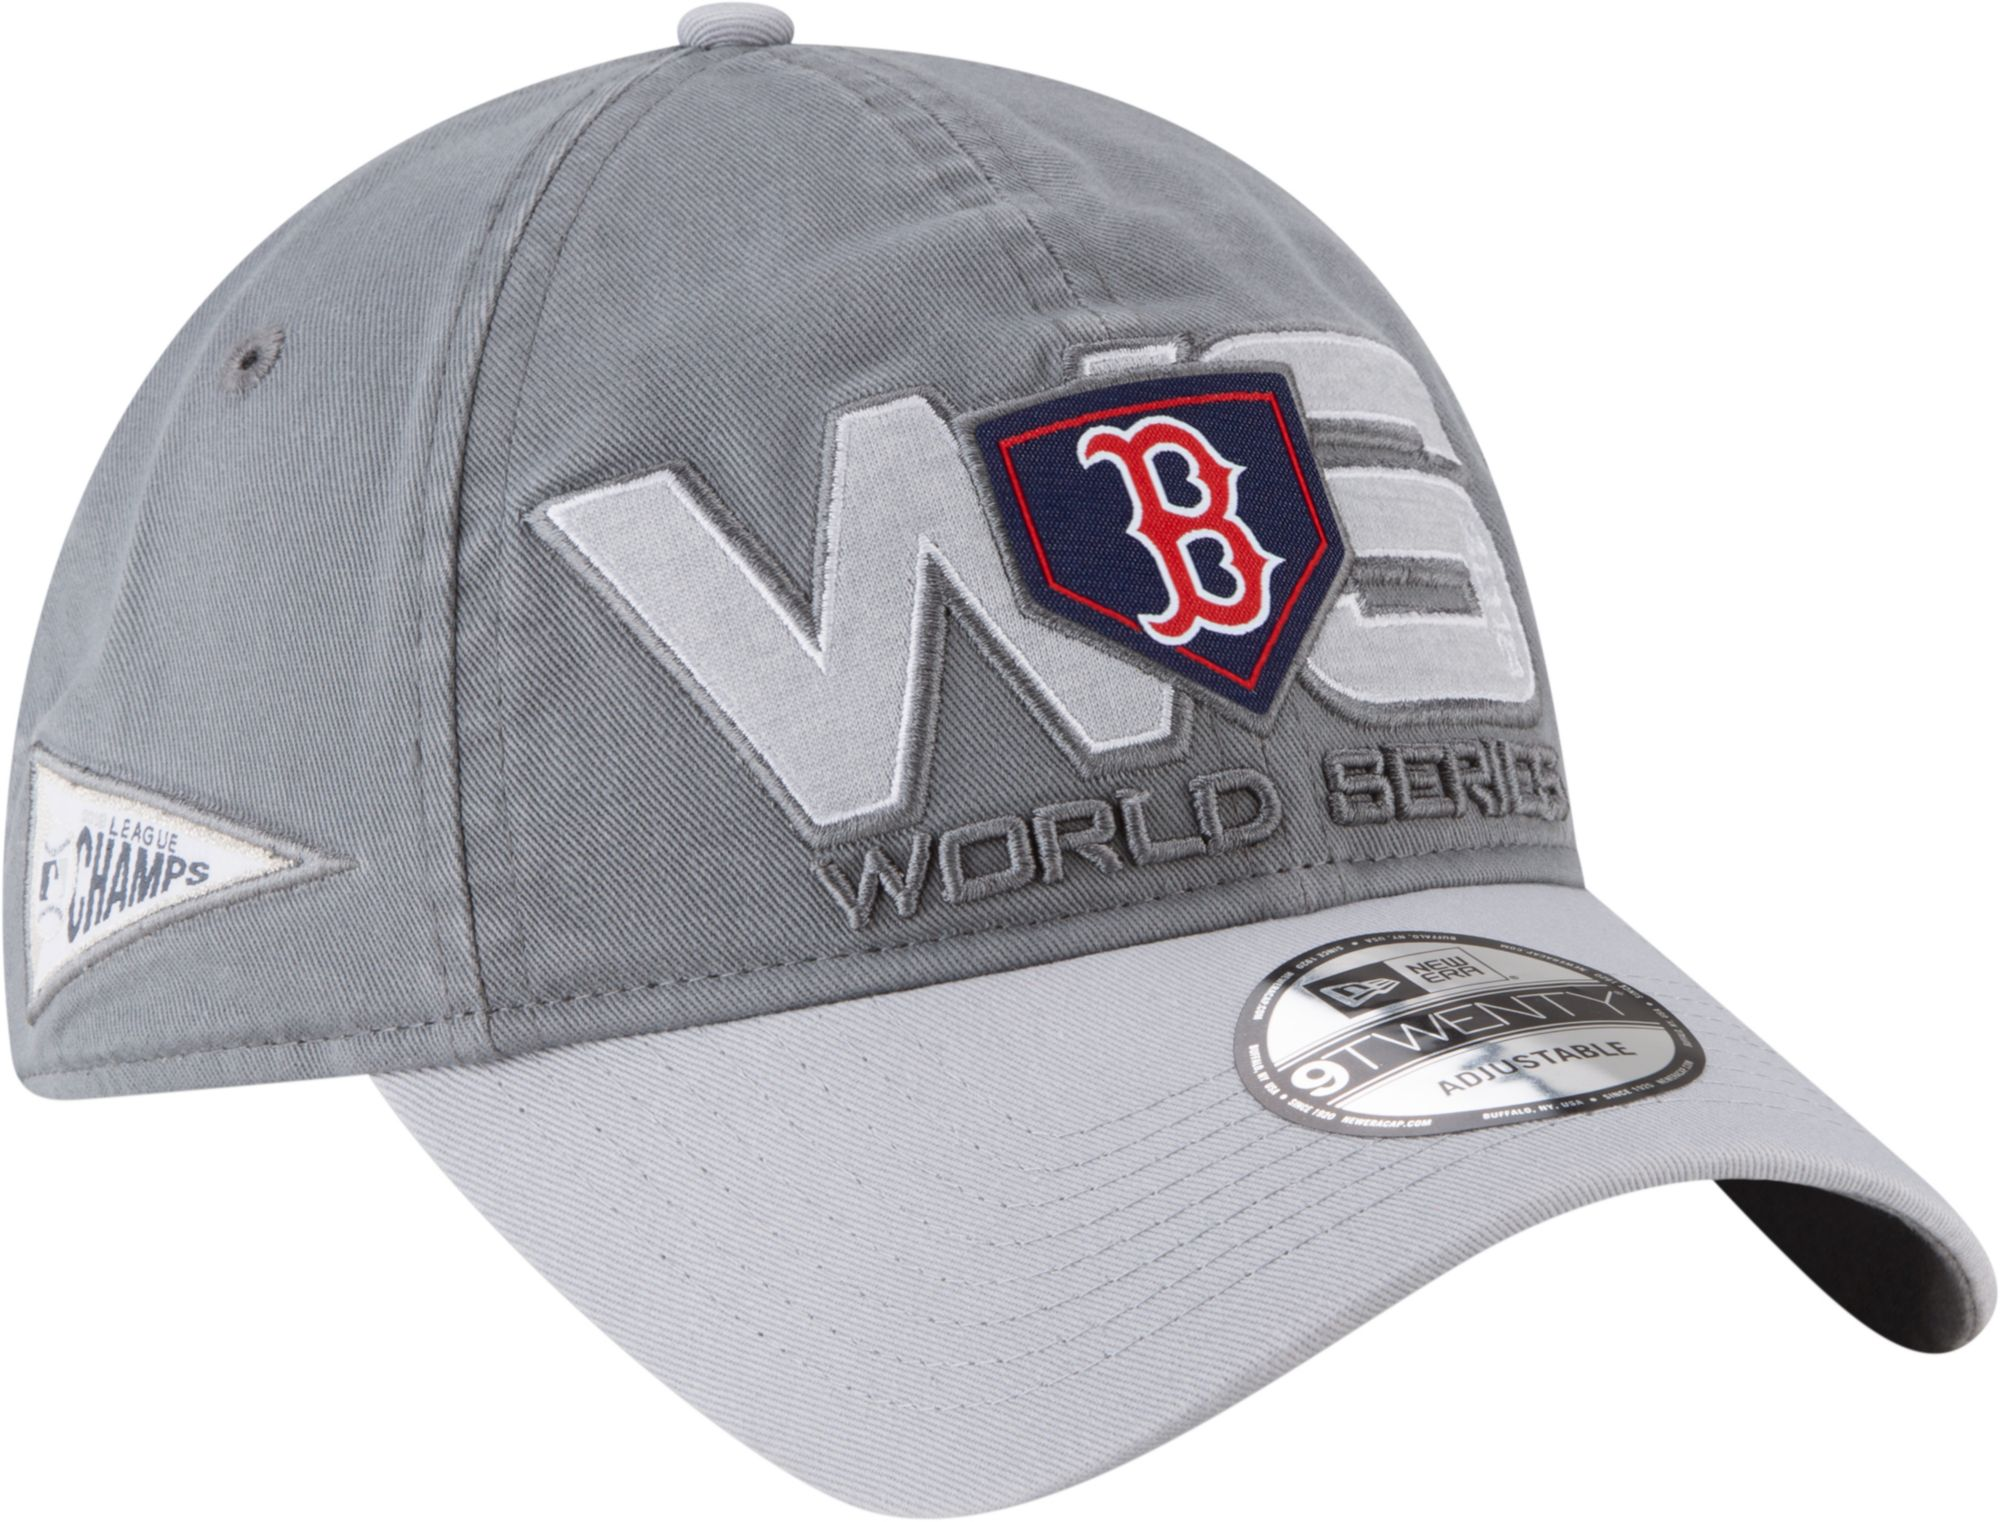 low cost 705c4 673c8 ... portland trail blazers triple gold 9fifty snapback cap red gold  france new  era mens 2018 al champions locker room 9twenty boston red sox adjustable hat  ...